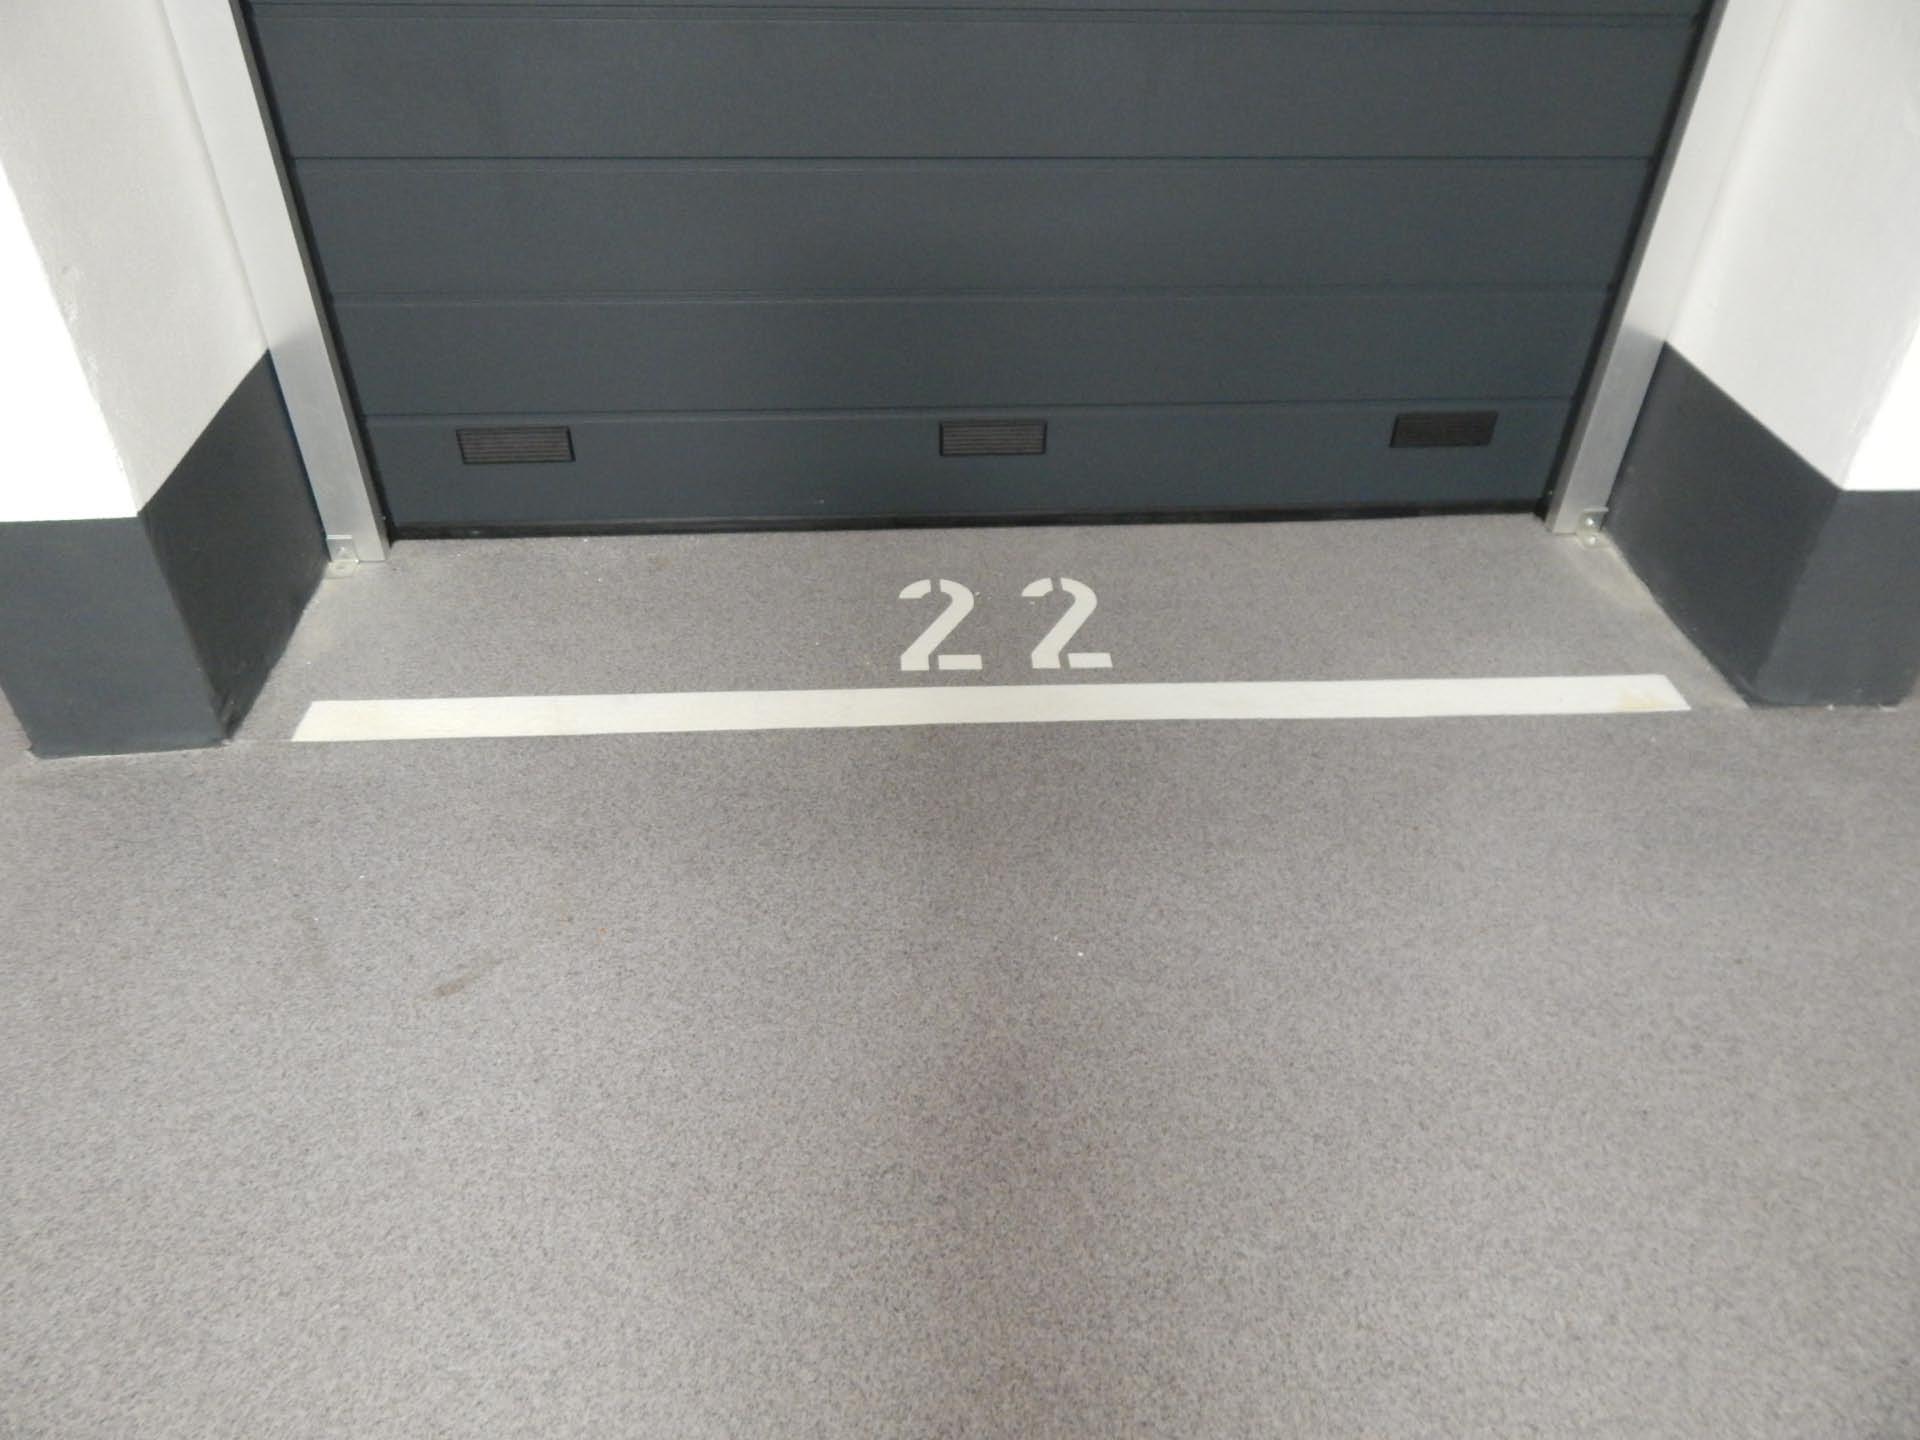 Boden Fur Tiefgaragen Garagen Held Industrieboden